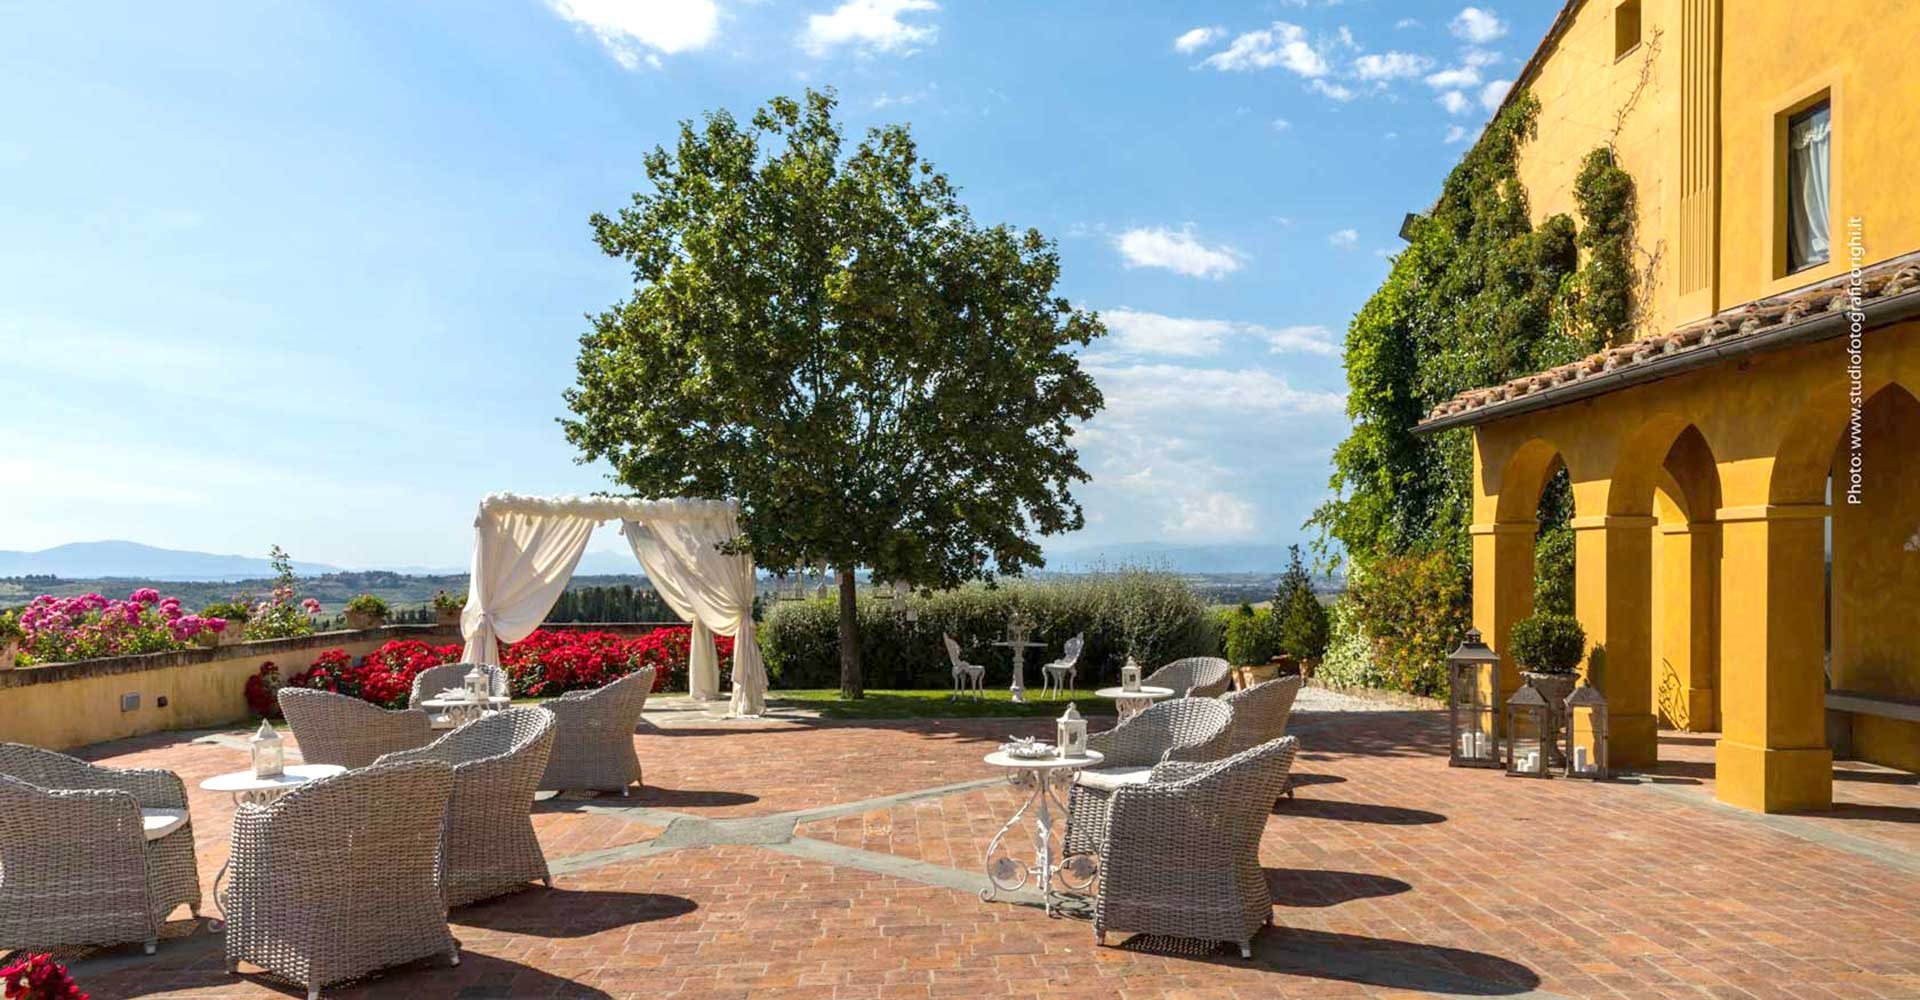 Matrimoni Civili Toscana : Ville matrimoni toscana firenze per